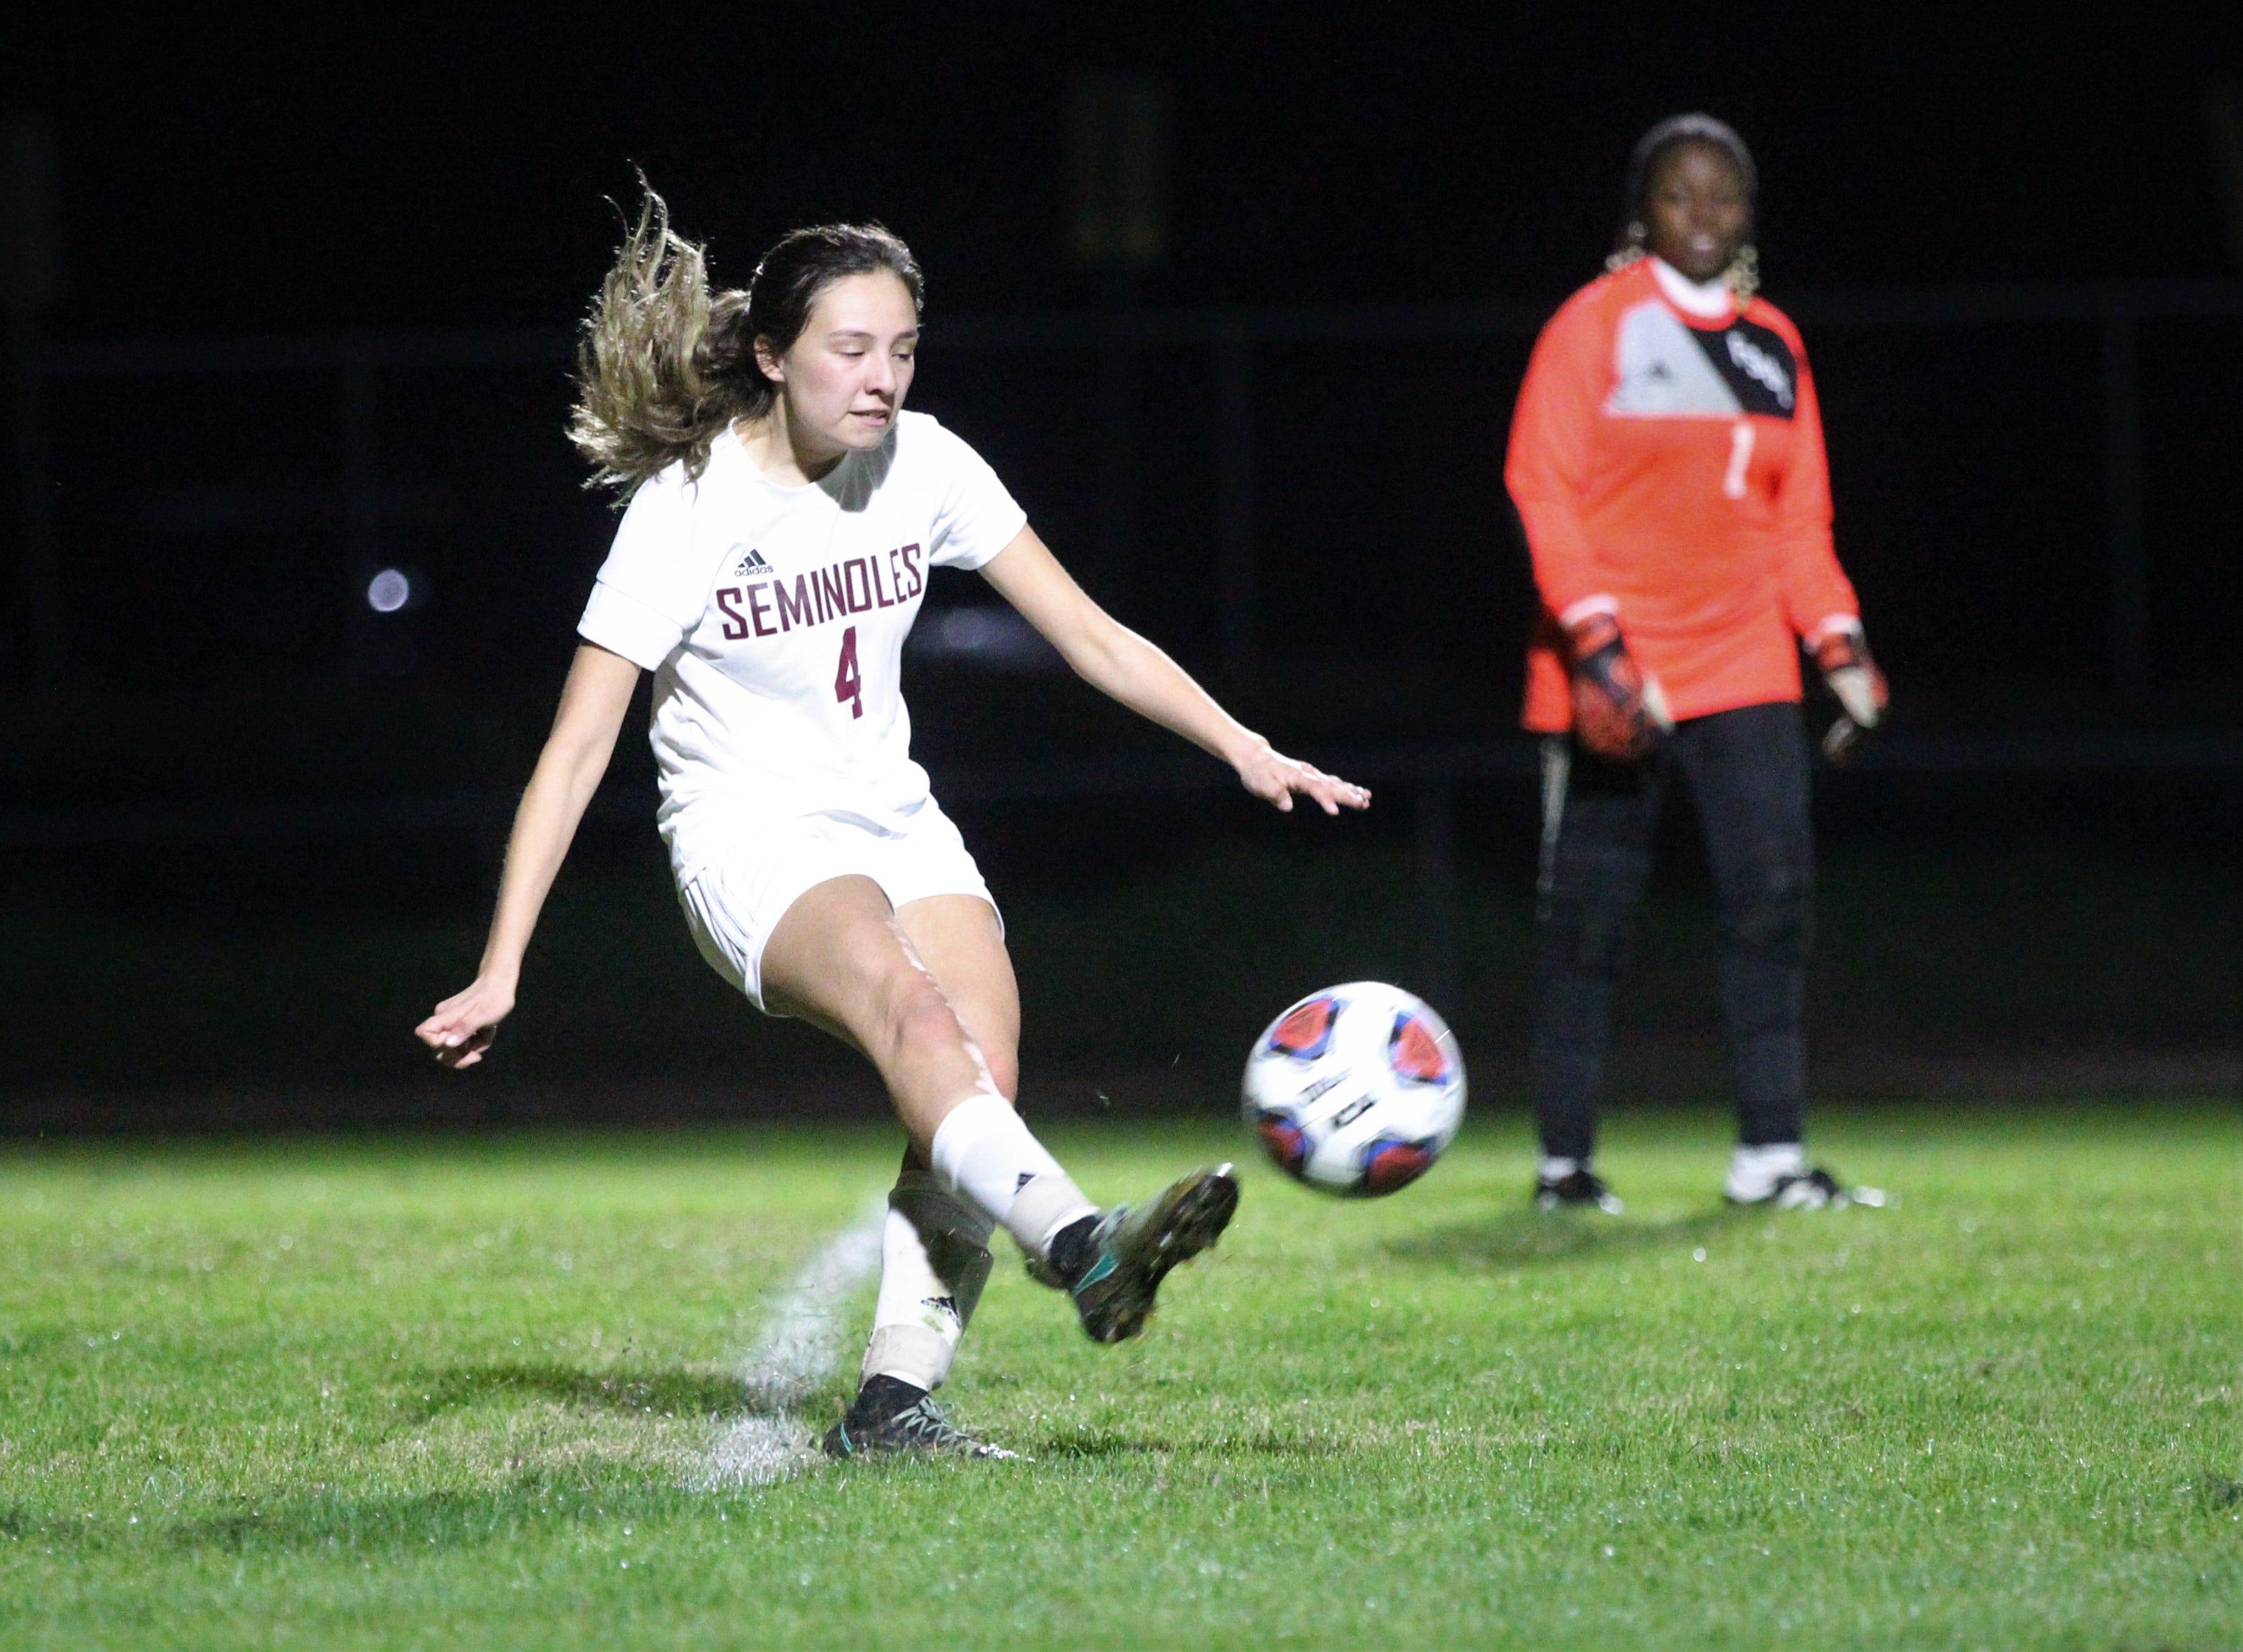 Florida High's Daphne Cervantes hits a goal kick as Maclay won 3-0 at home against Florida High on Jan. 8, 2019.